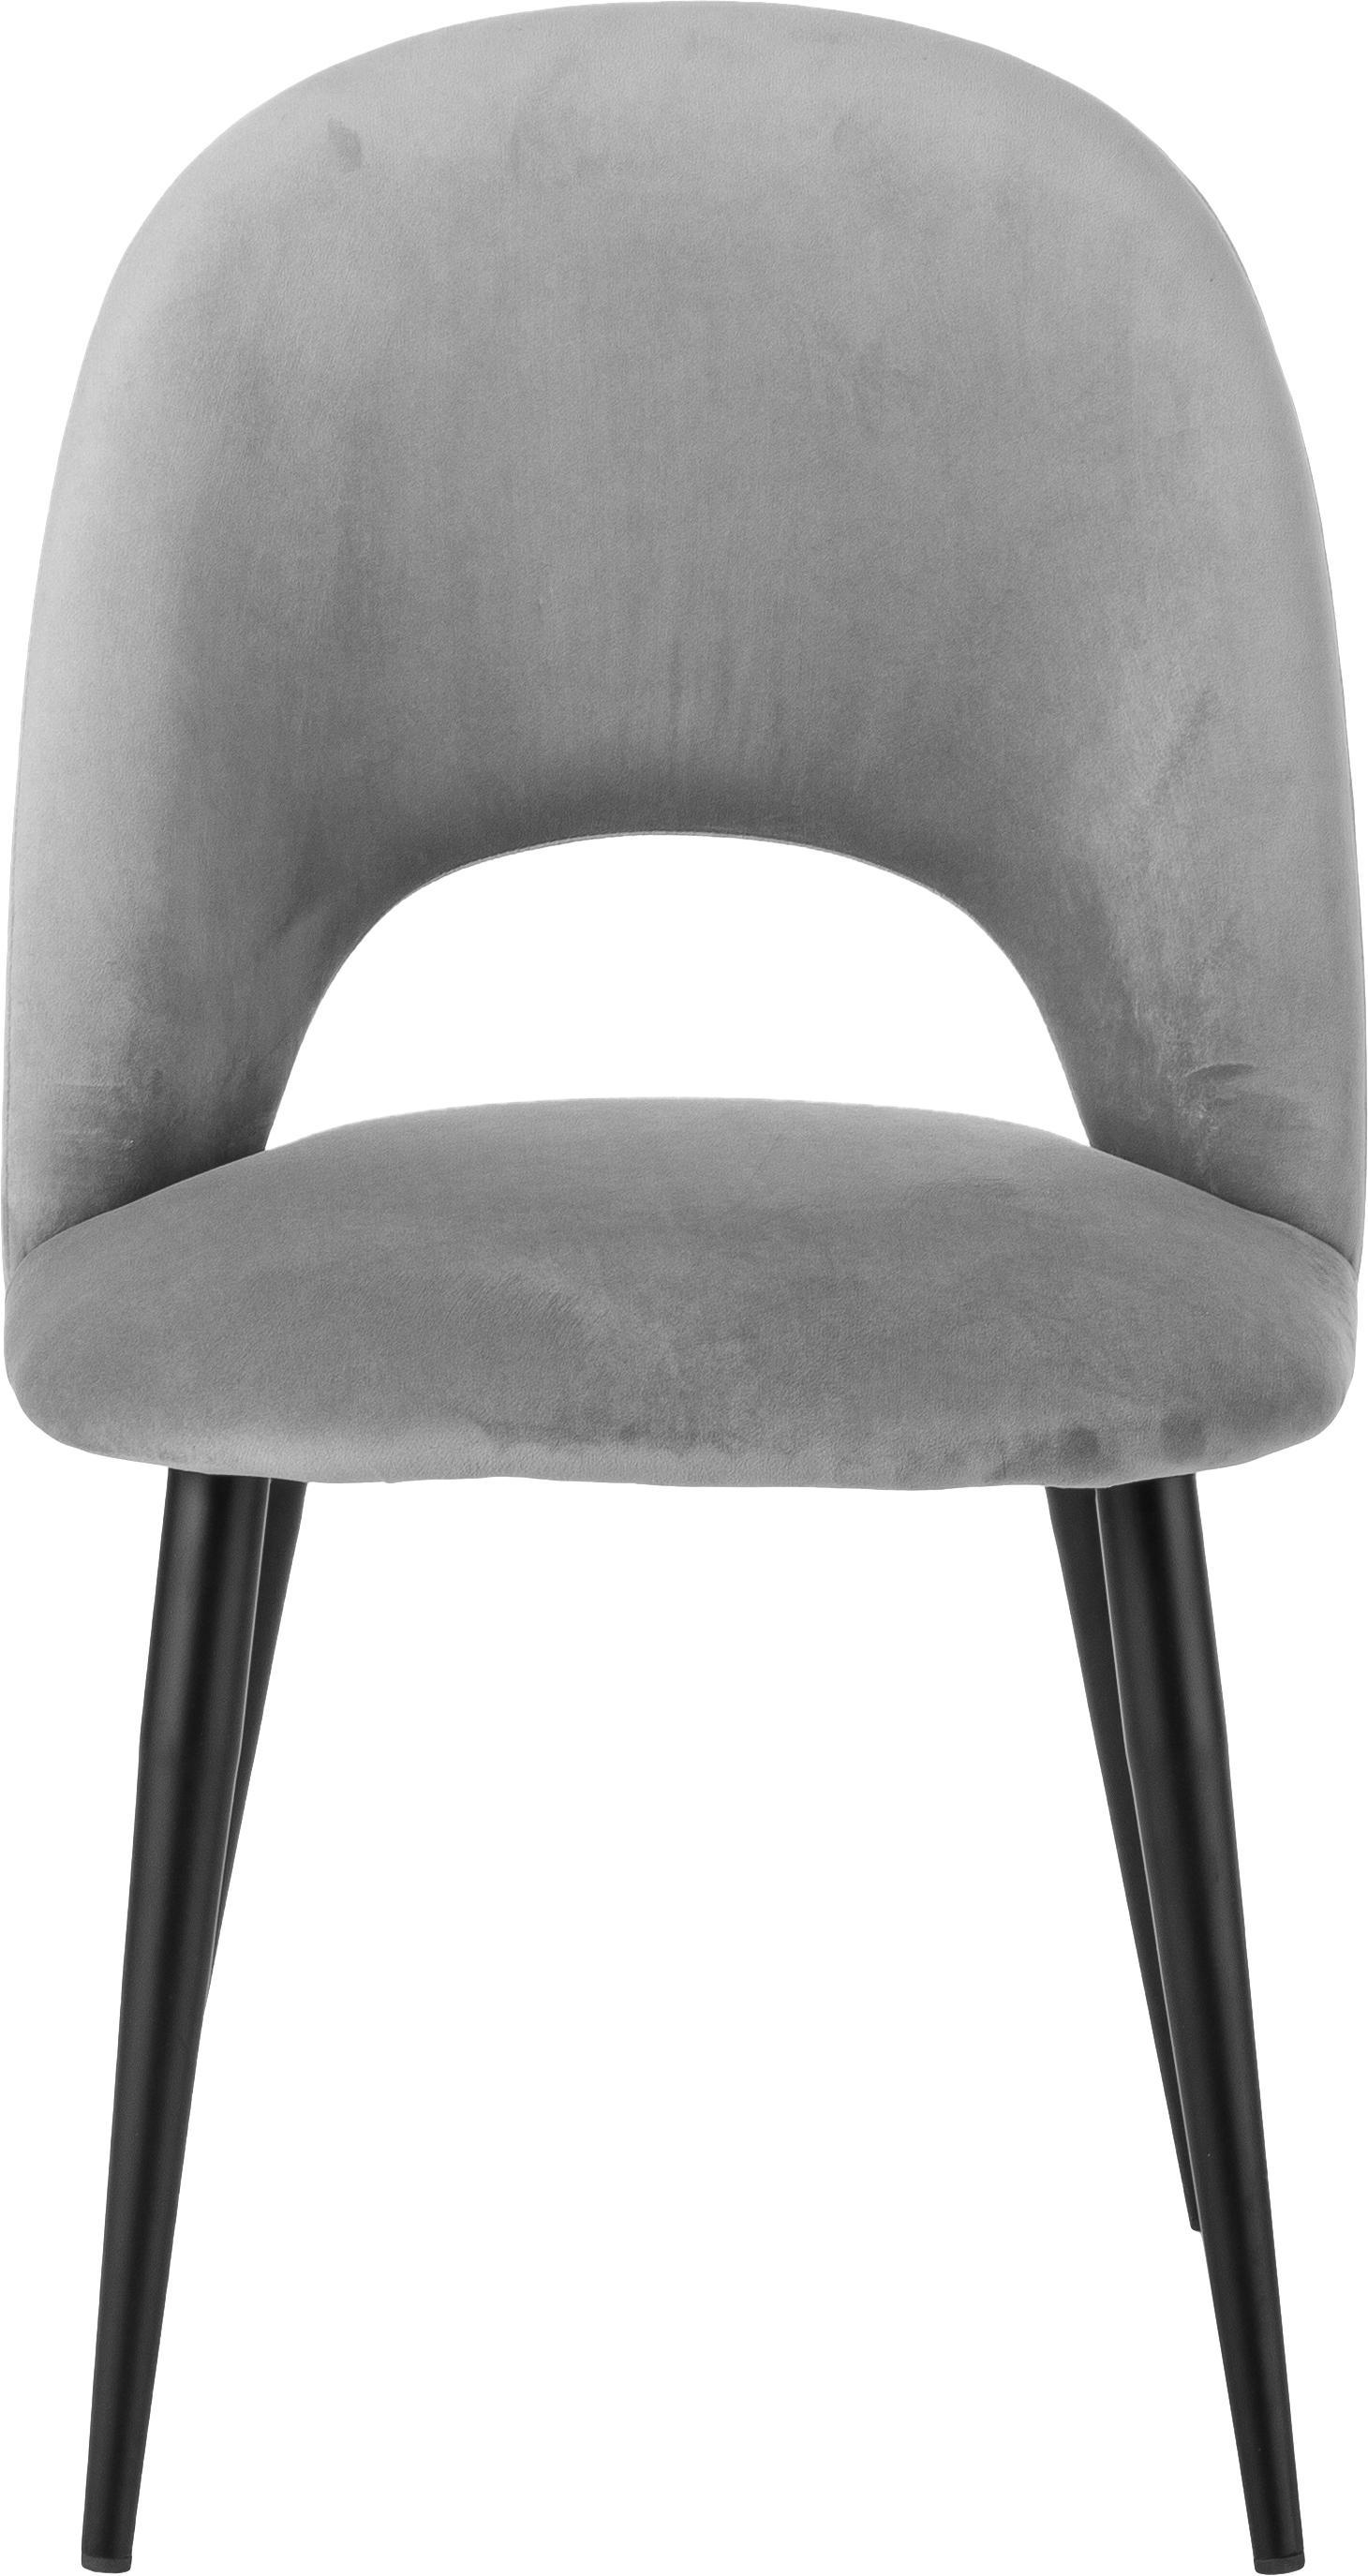 Sedia imbottita in velluto Rachel, Rivestimento: velluto (rivestimento in , Gambe: metallo verniciato a polv, Grigio chiaro, Larg. 53 x Prof. 57 cm